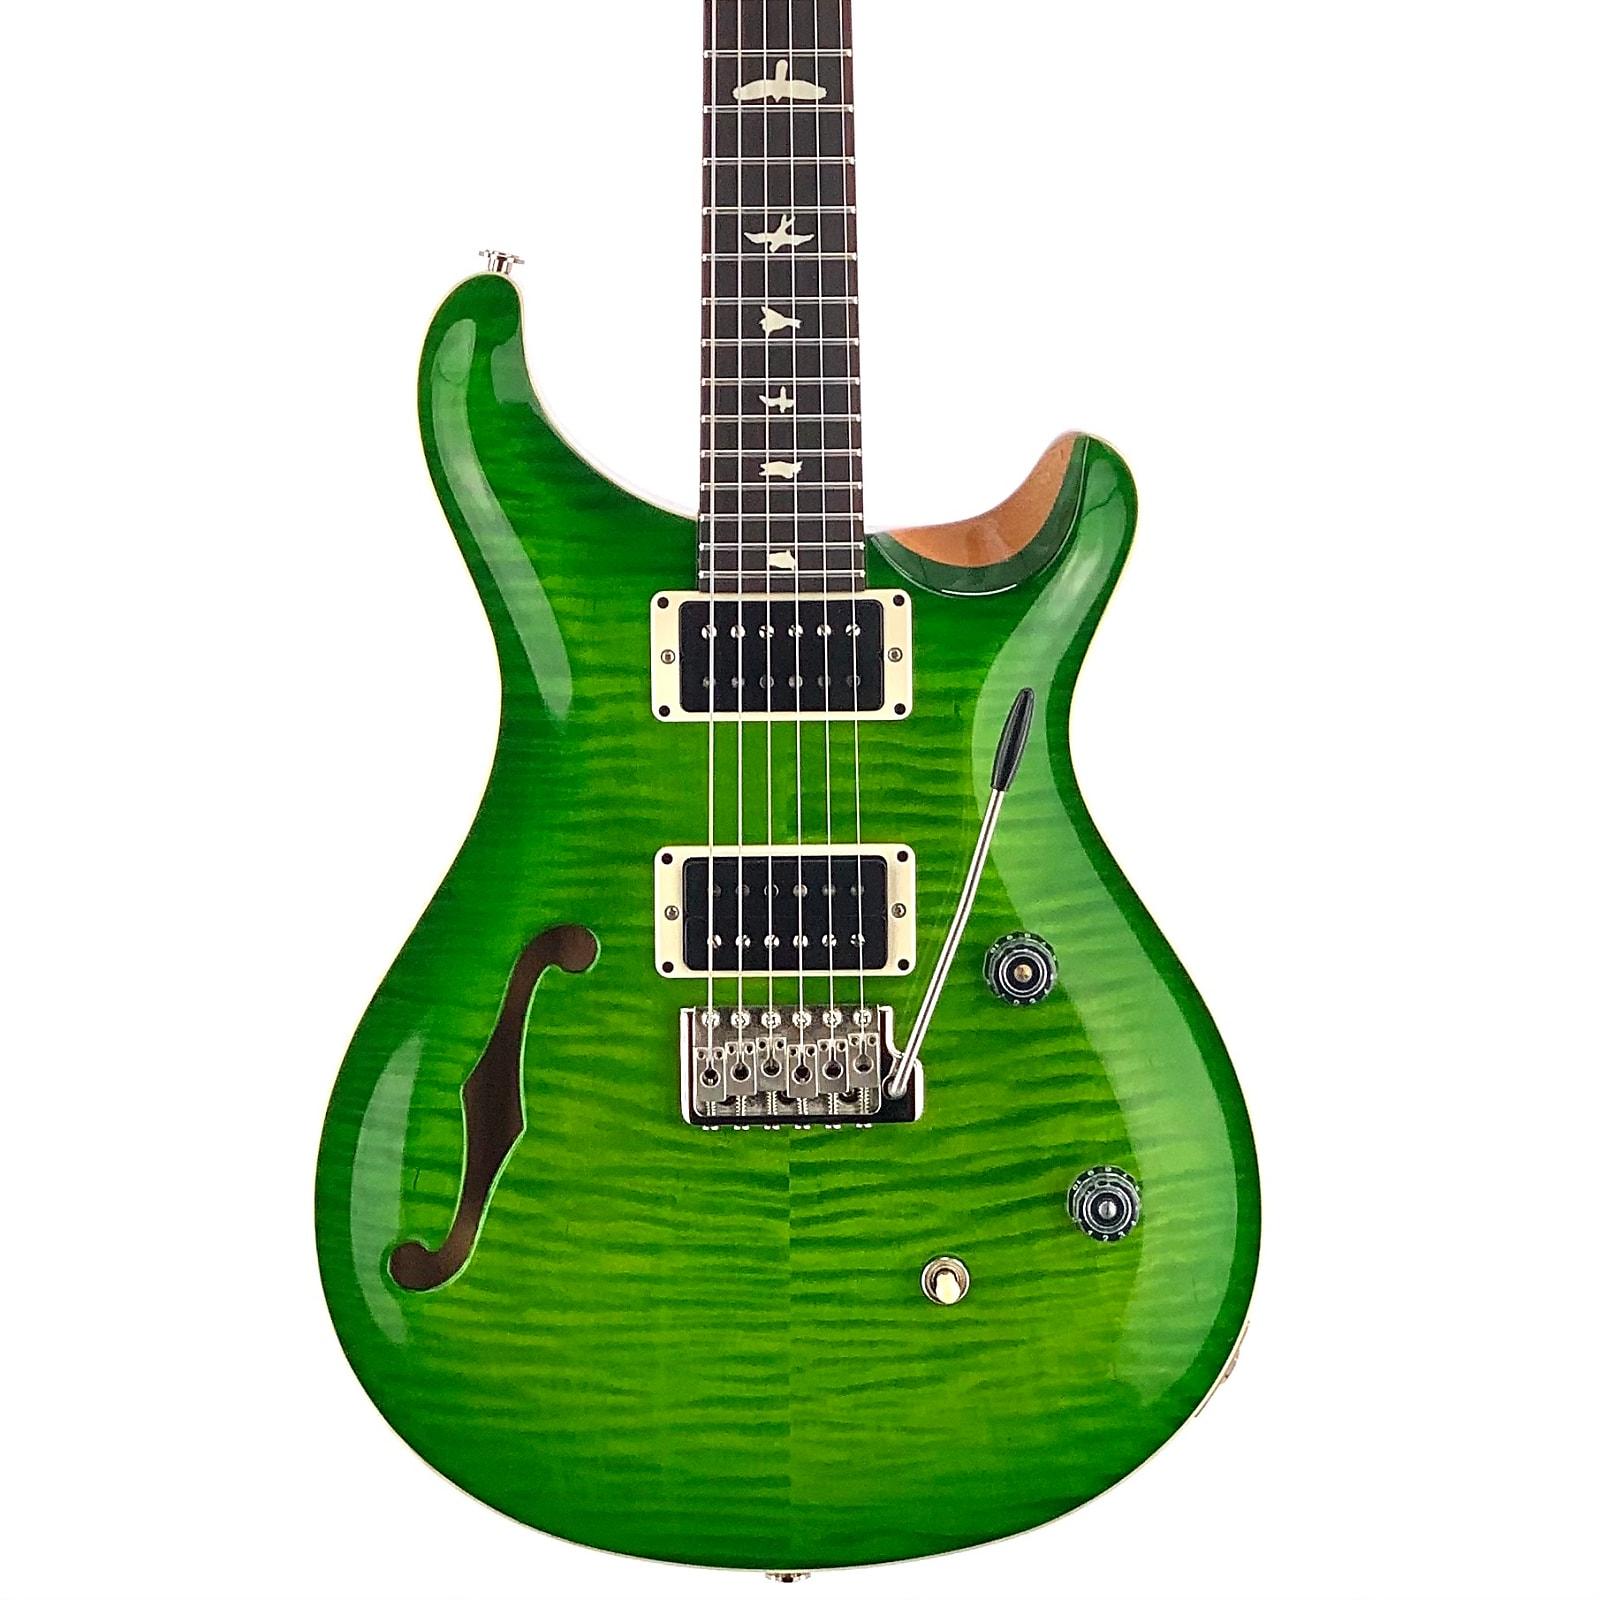 PRS CE24 Semi-Hollow - 2021 - Eriza Verde - In Stock Now!